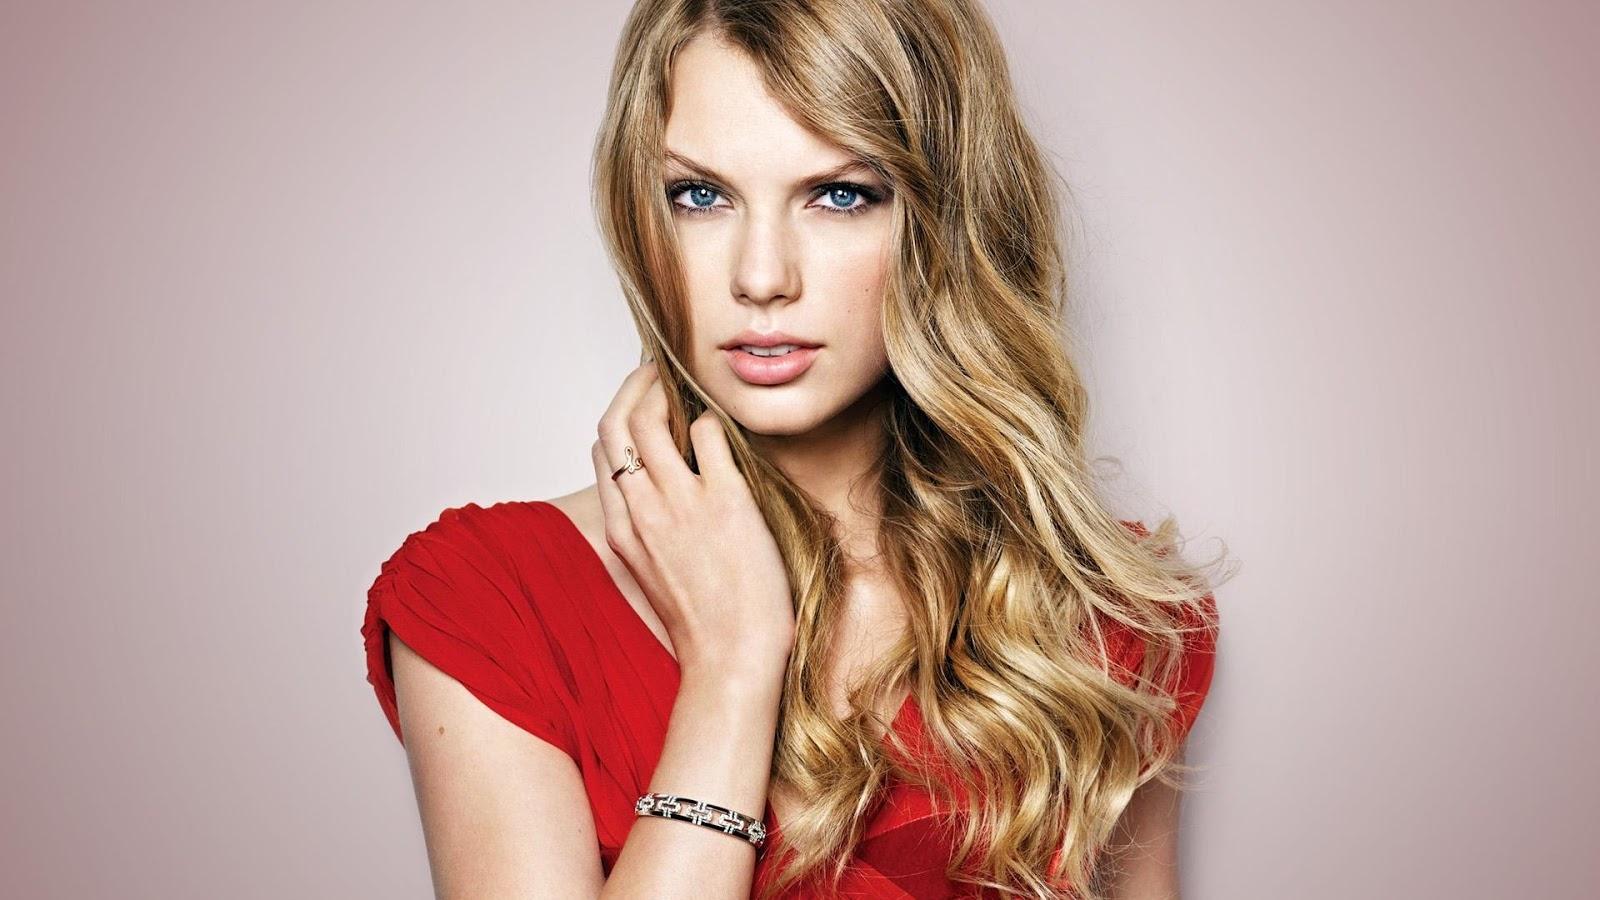 Taylor Swift 1920x1080